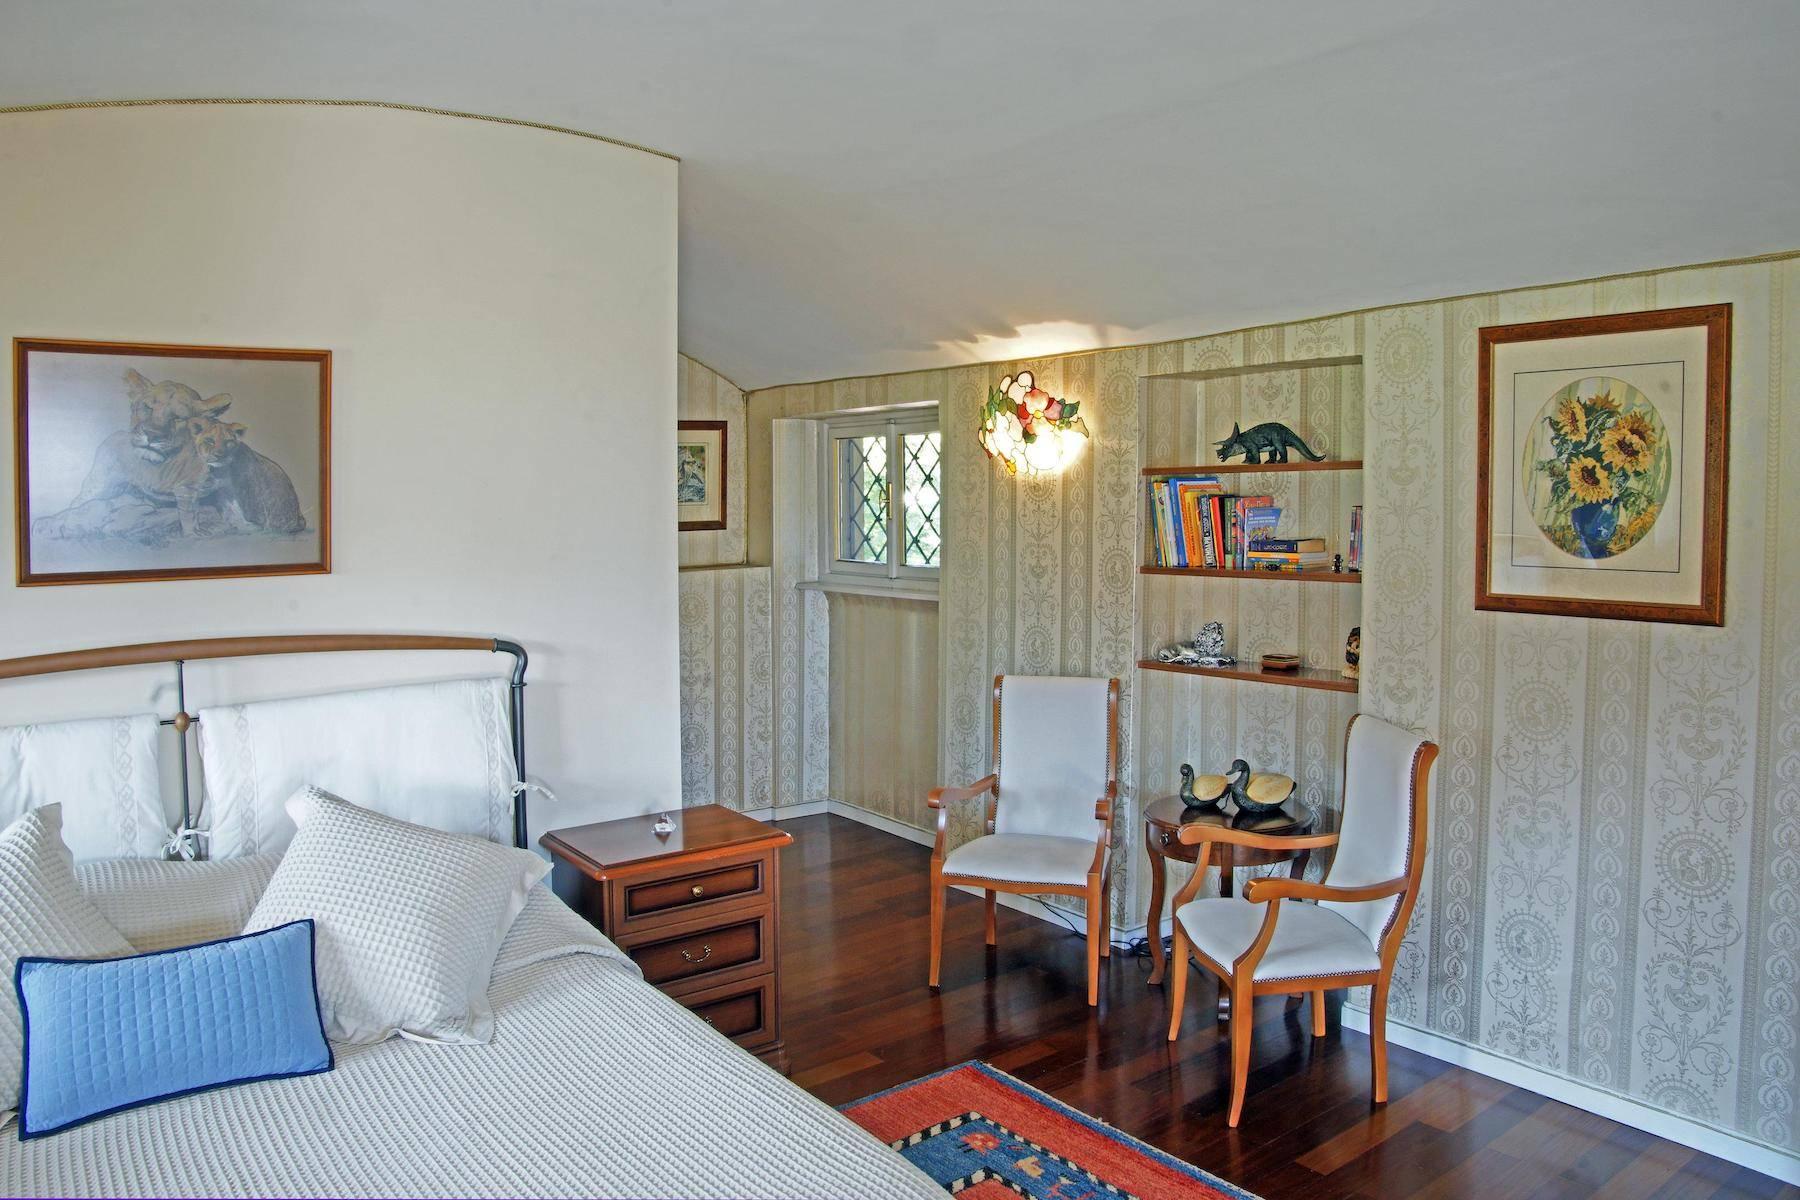 Villa in Vendita a Stresa: 5 locali, 700 mq - Foto 25